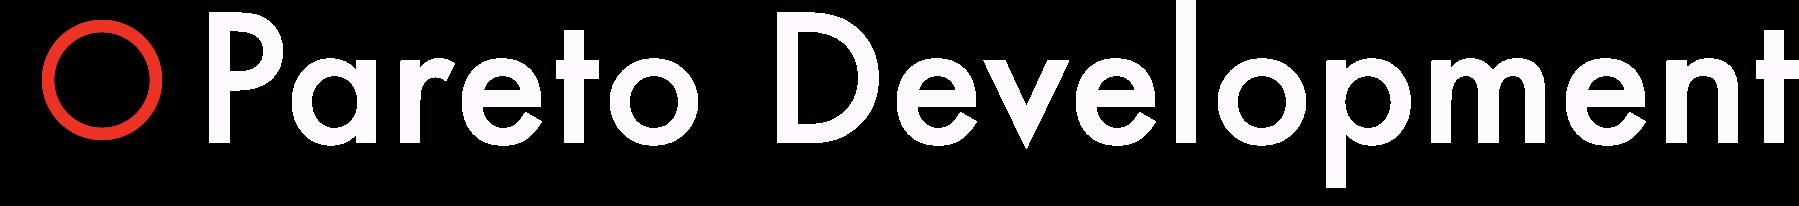 Pareto Development Logo.png